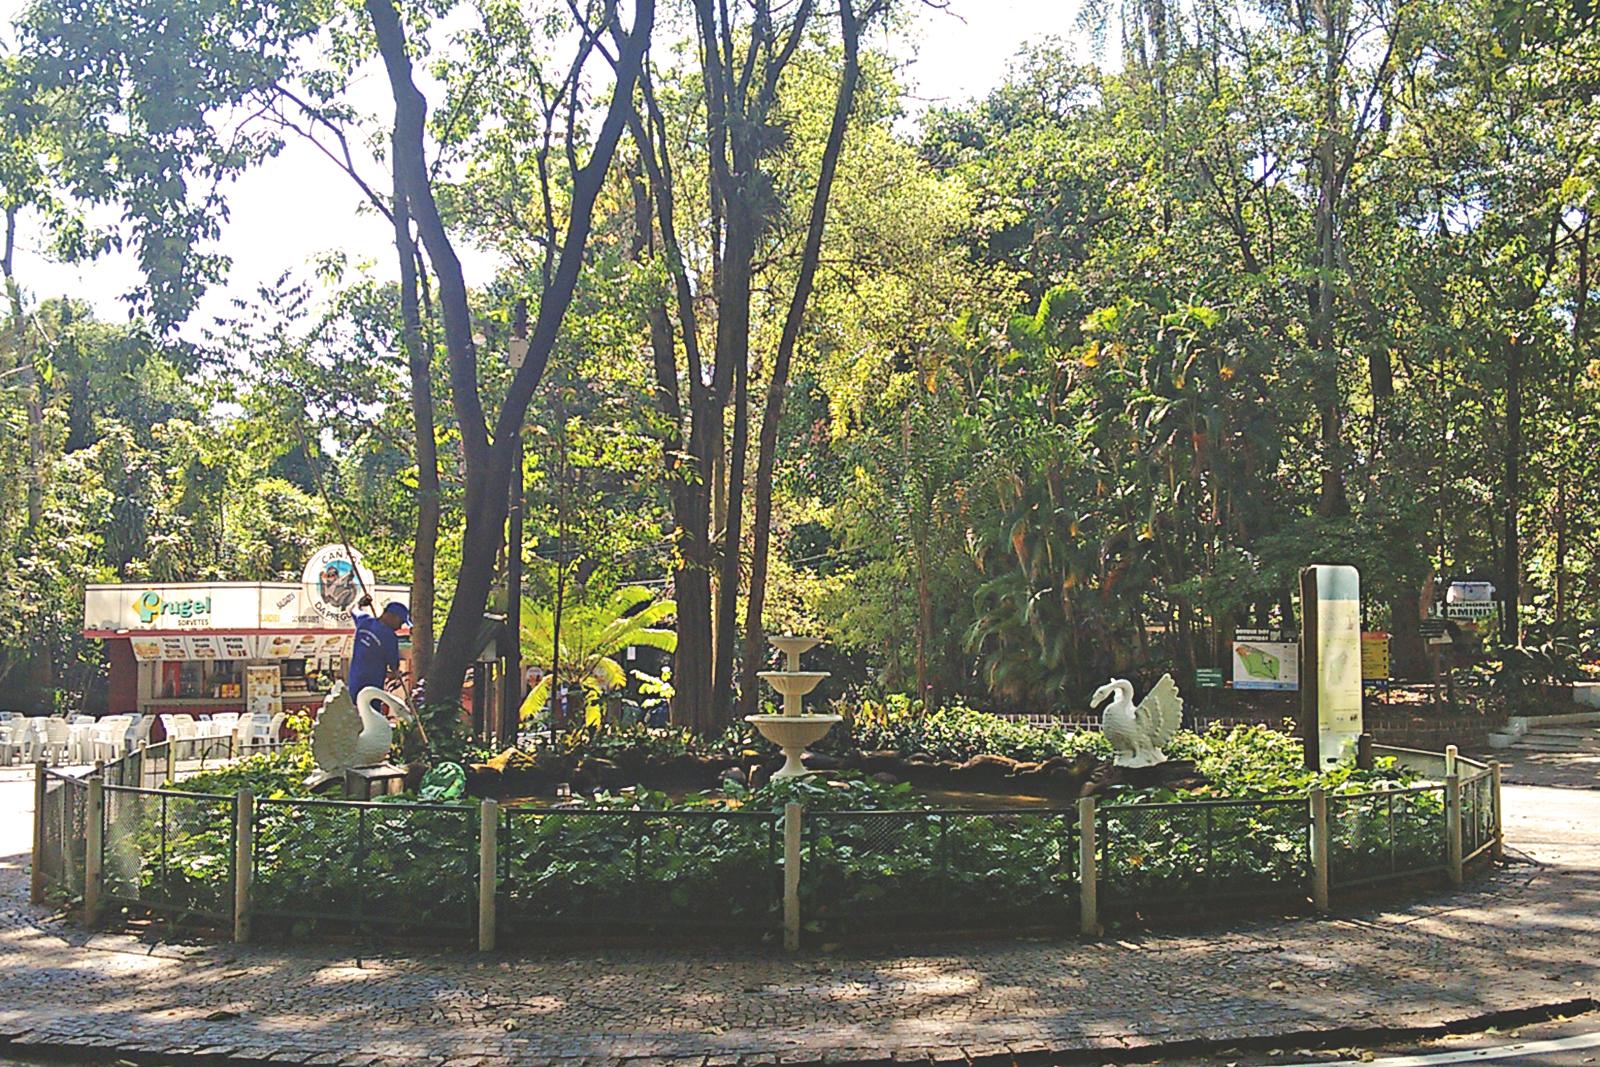 bosque dos jequitibas campinas